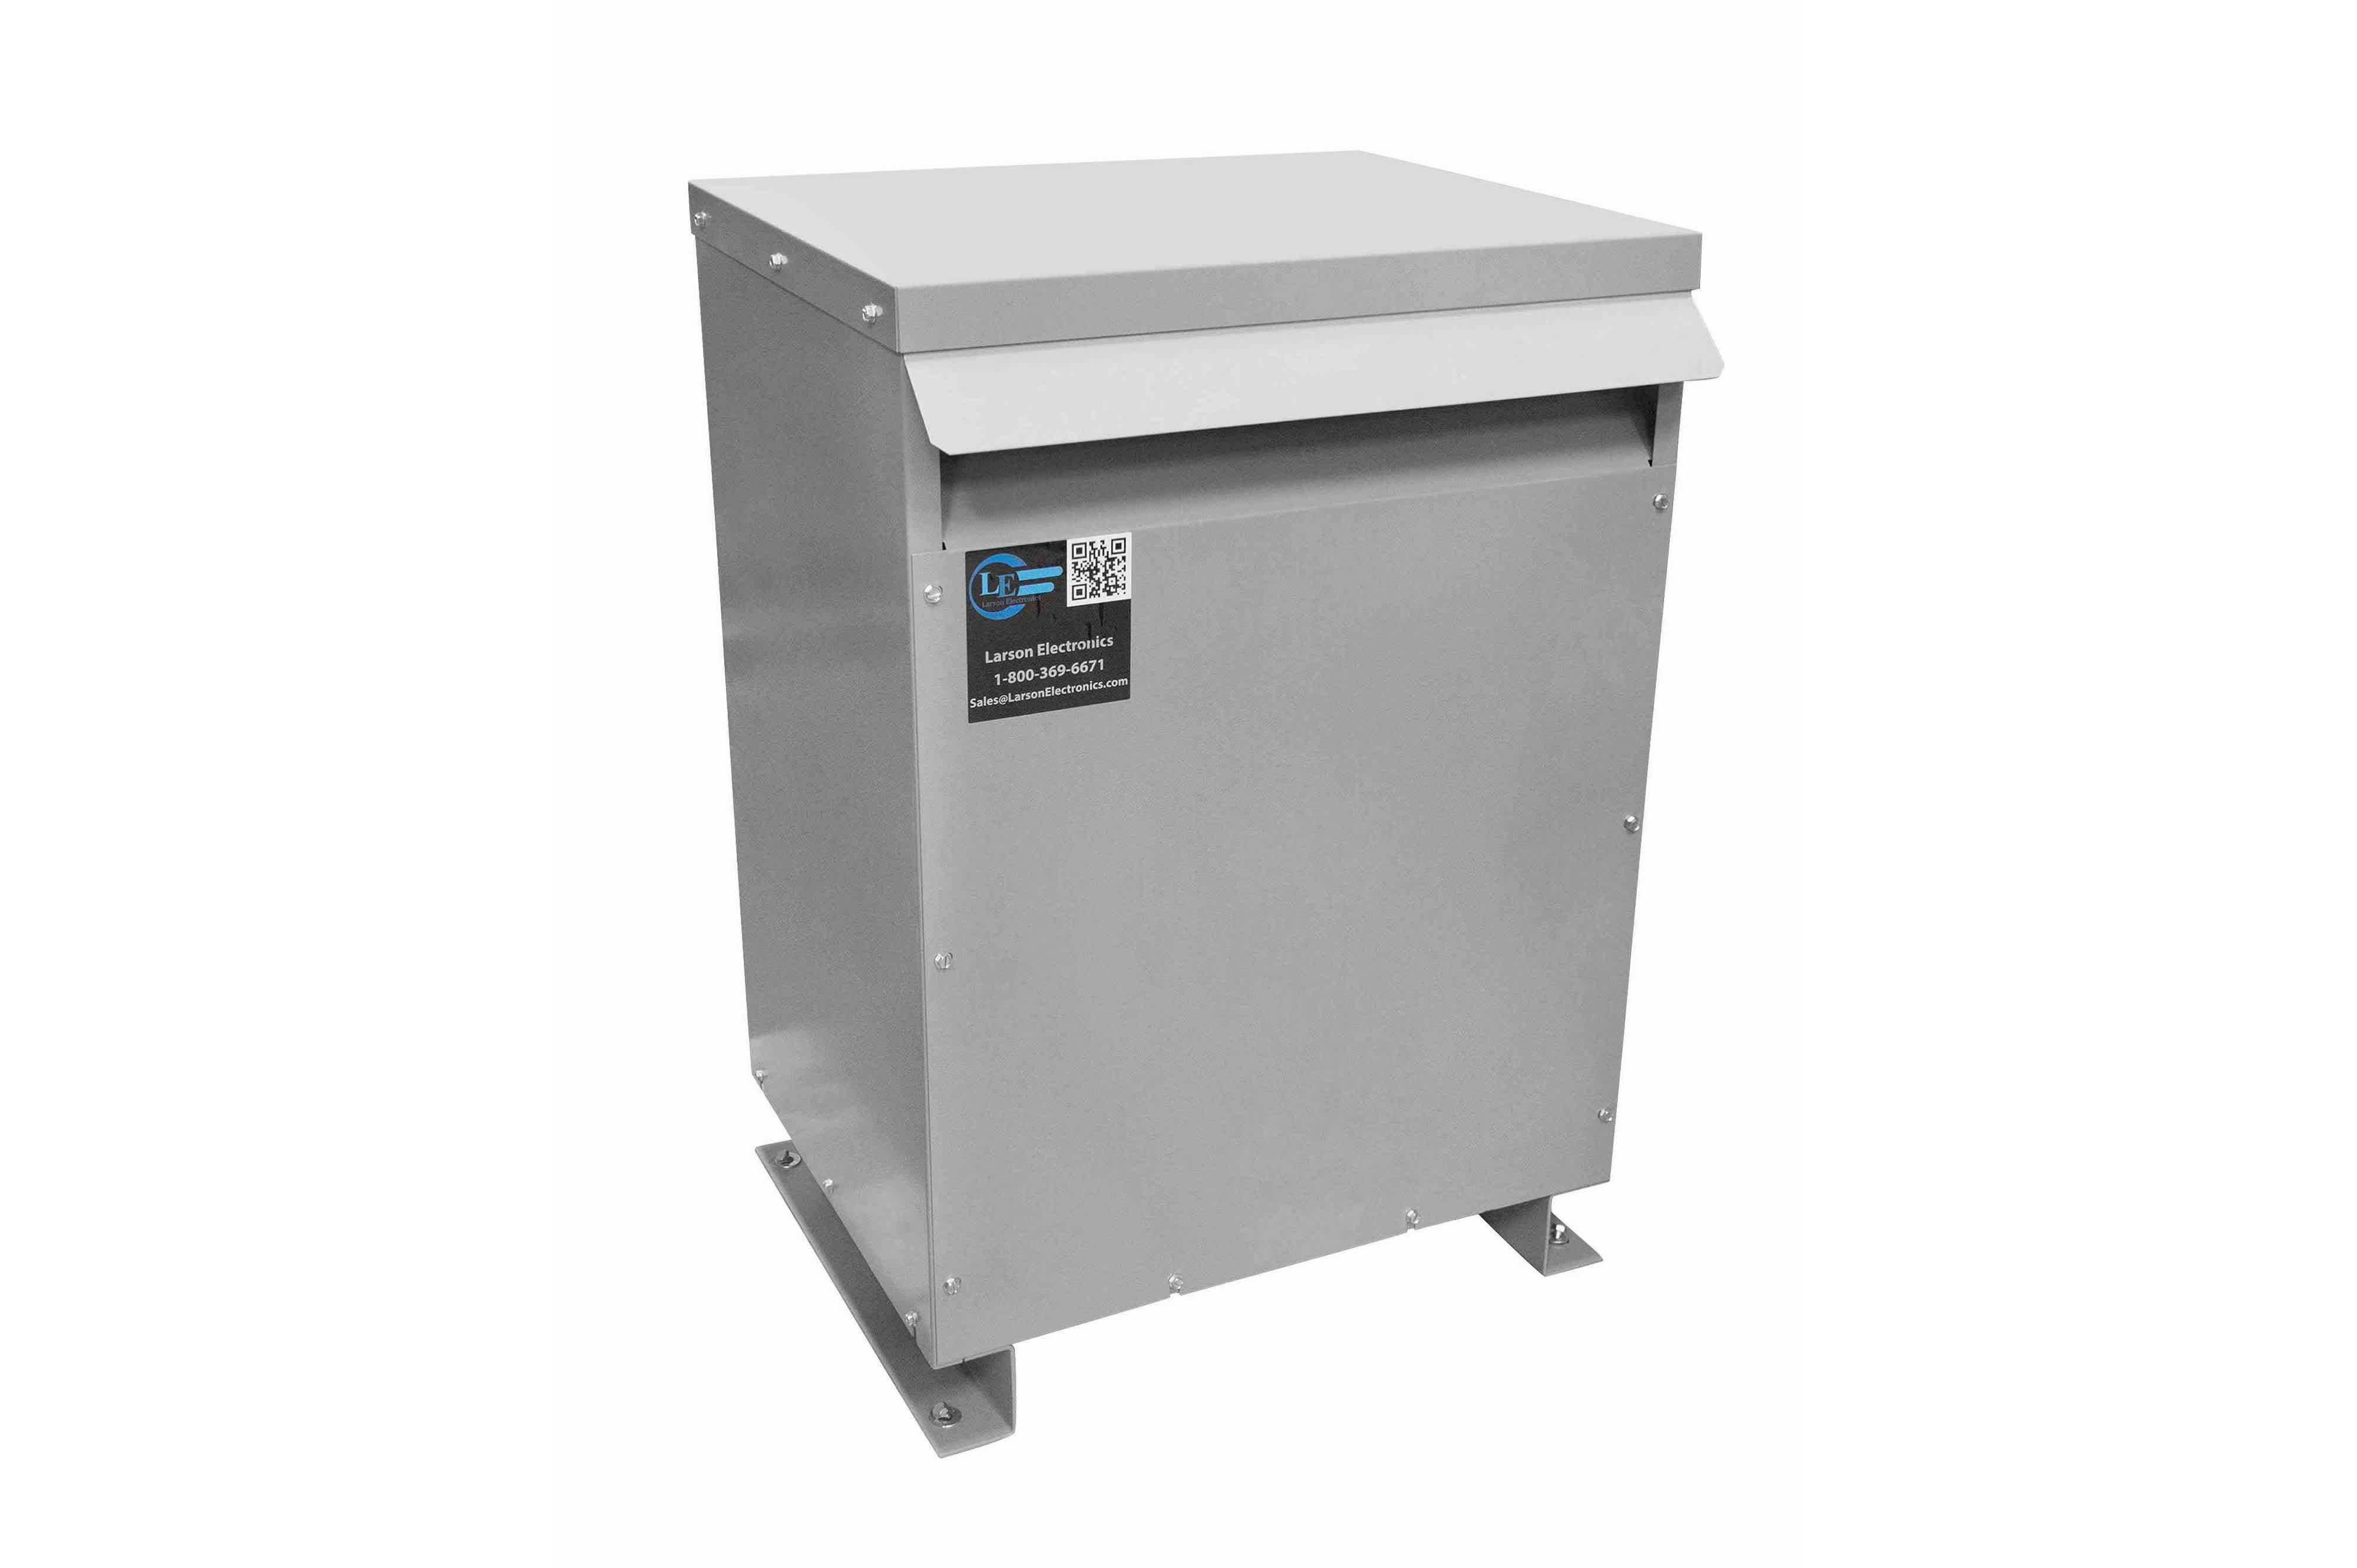 125 kVA 3PH Isolation Transformer, 230V Wye Primary, 480Y/277 Wye-N Secondary, N3R, Ventilated, 60 Hz